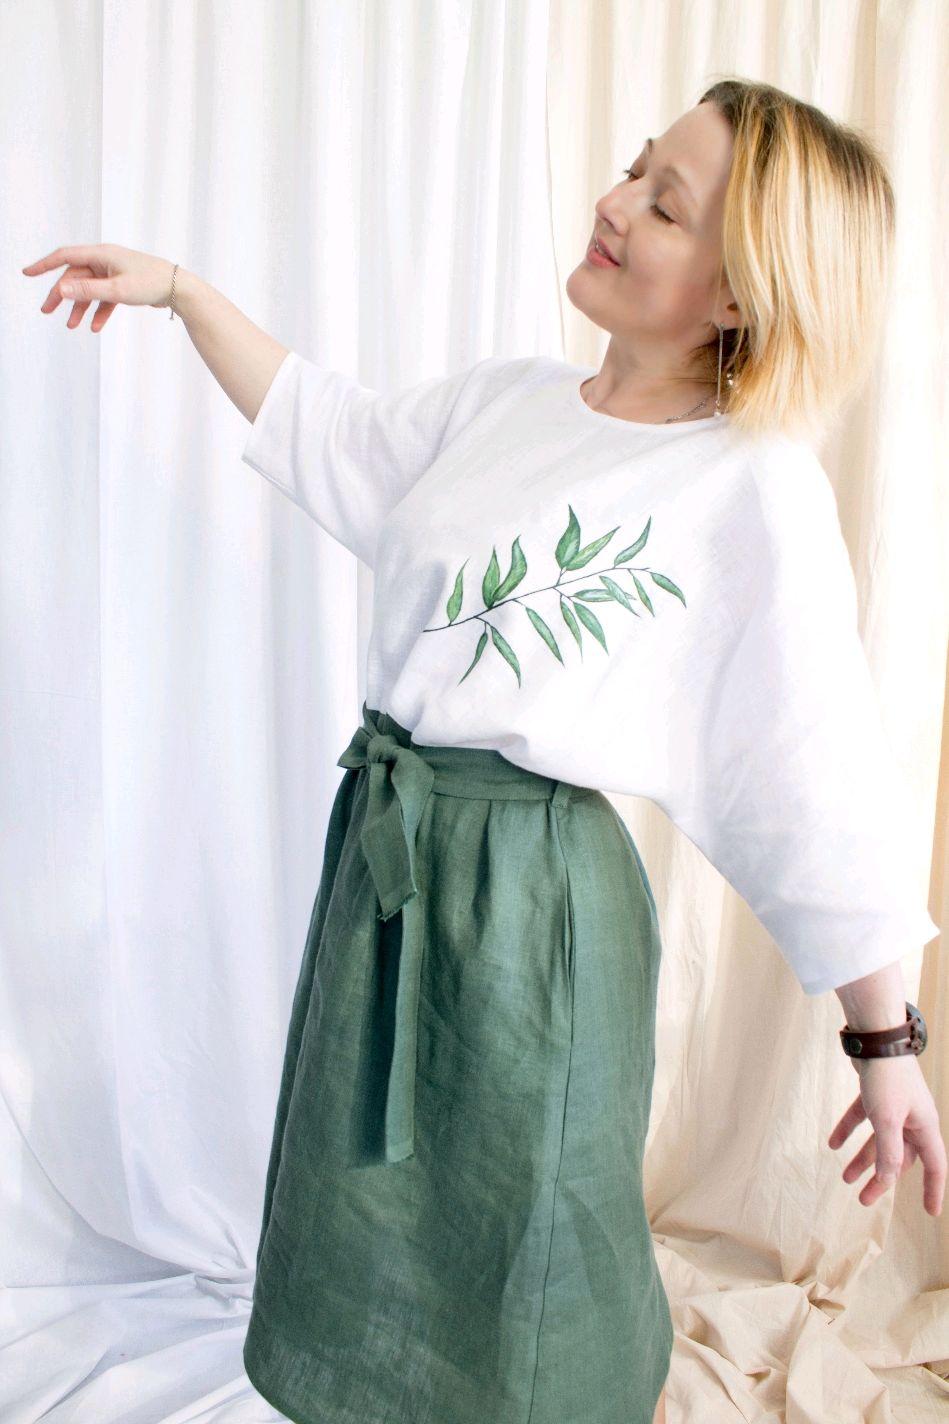 Льняное платье-балахон Ива, Платья, Кобрин,  Фото №1